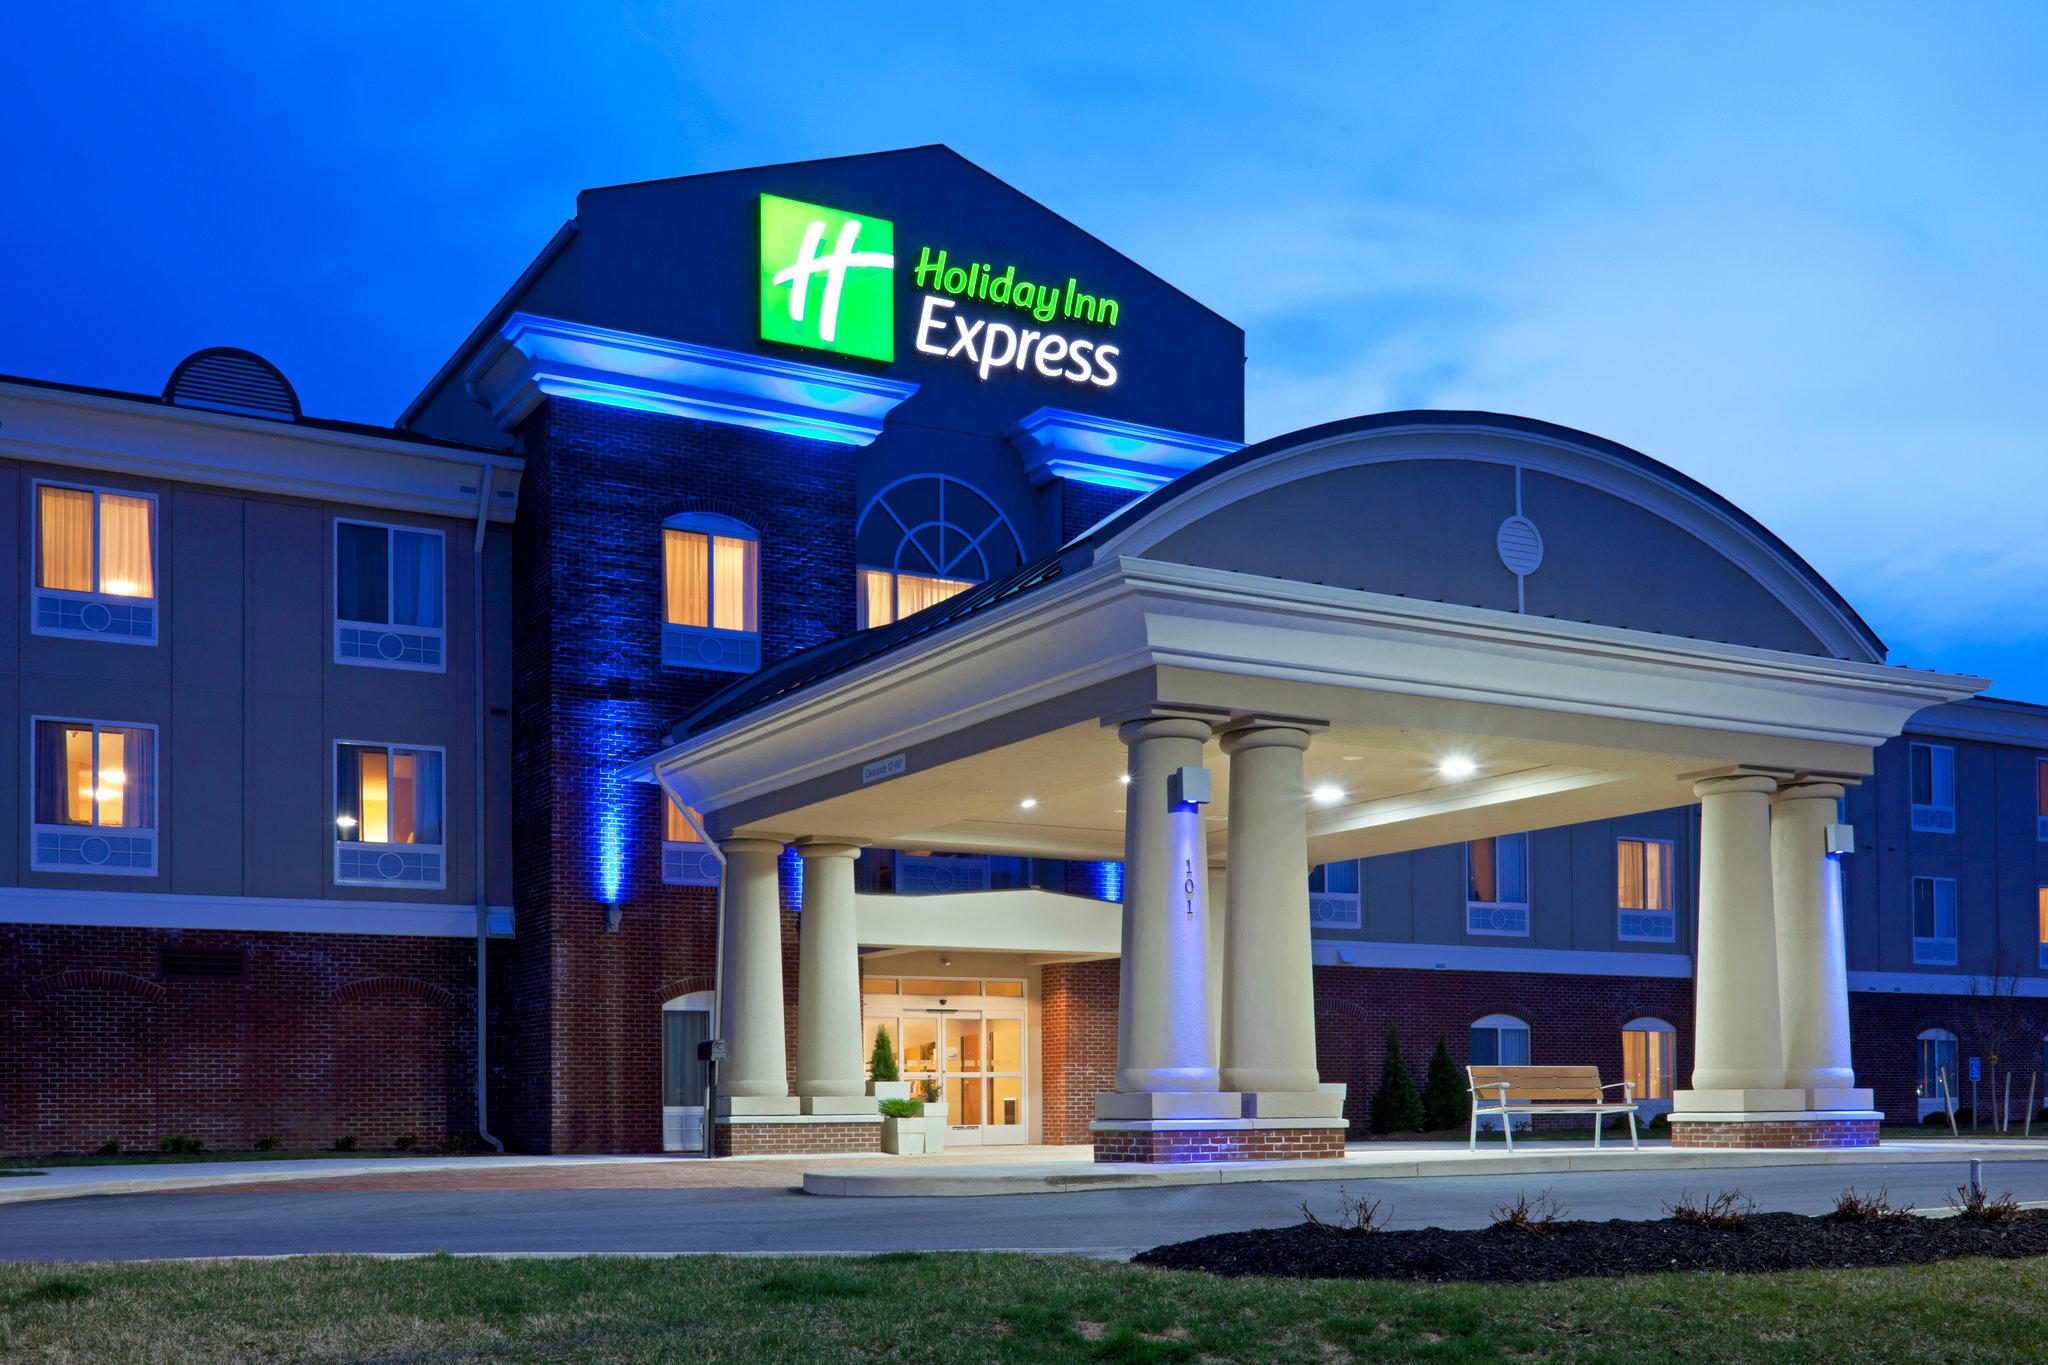 Holiday Inn Express WASHINGTON CH JEFFERSONVILLE S